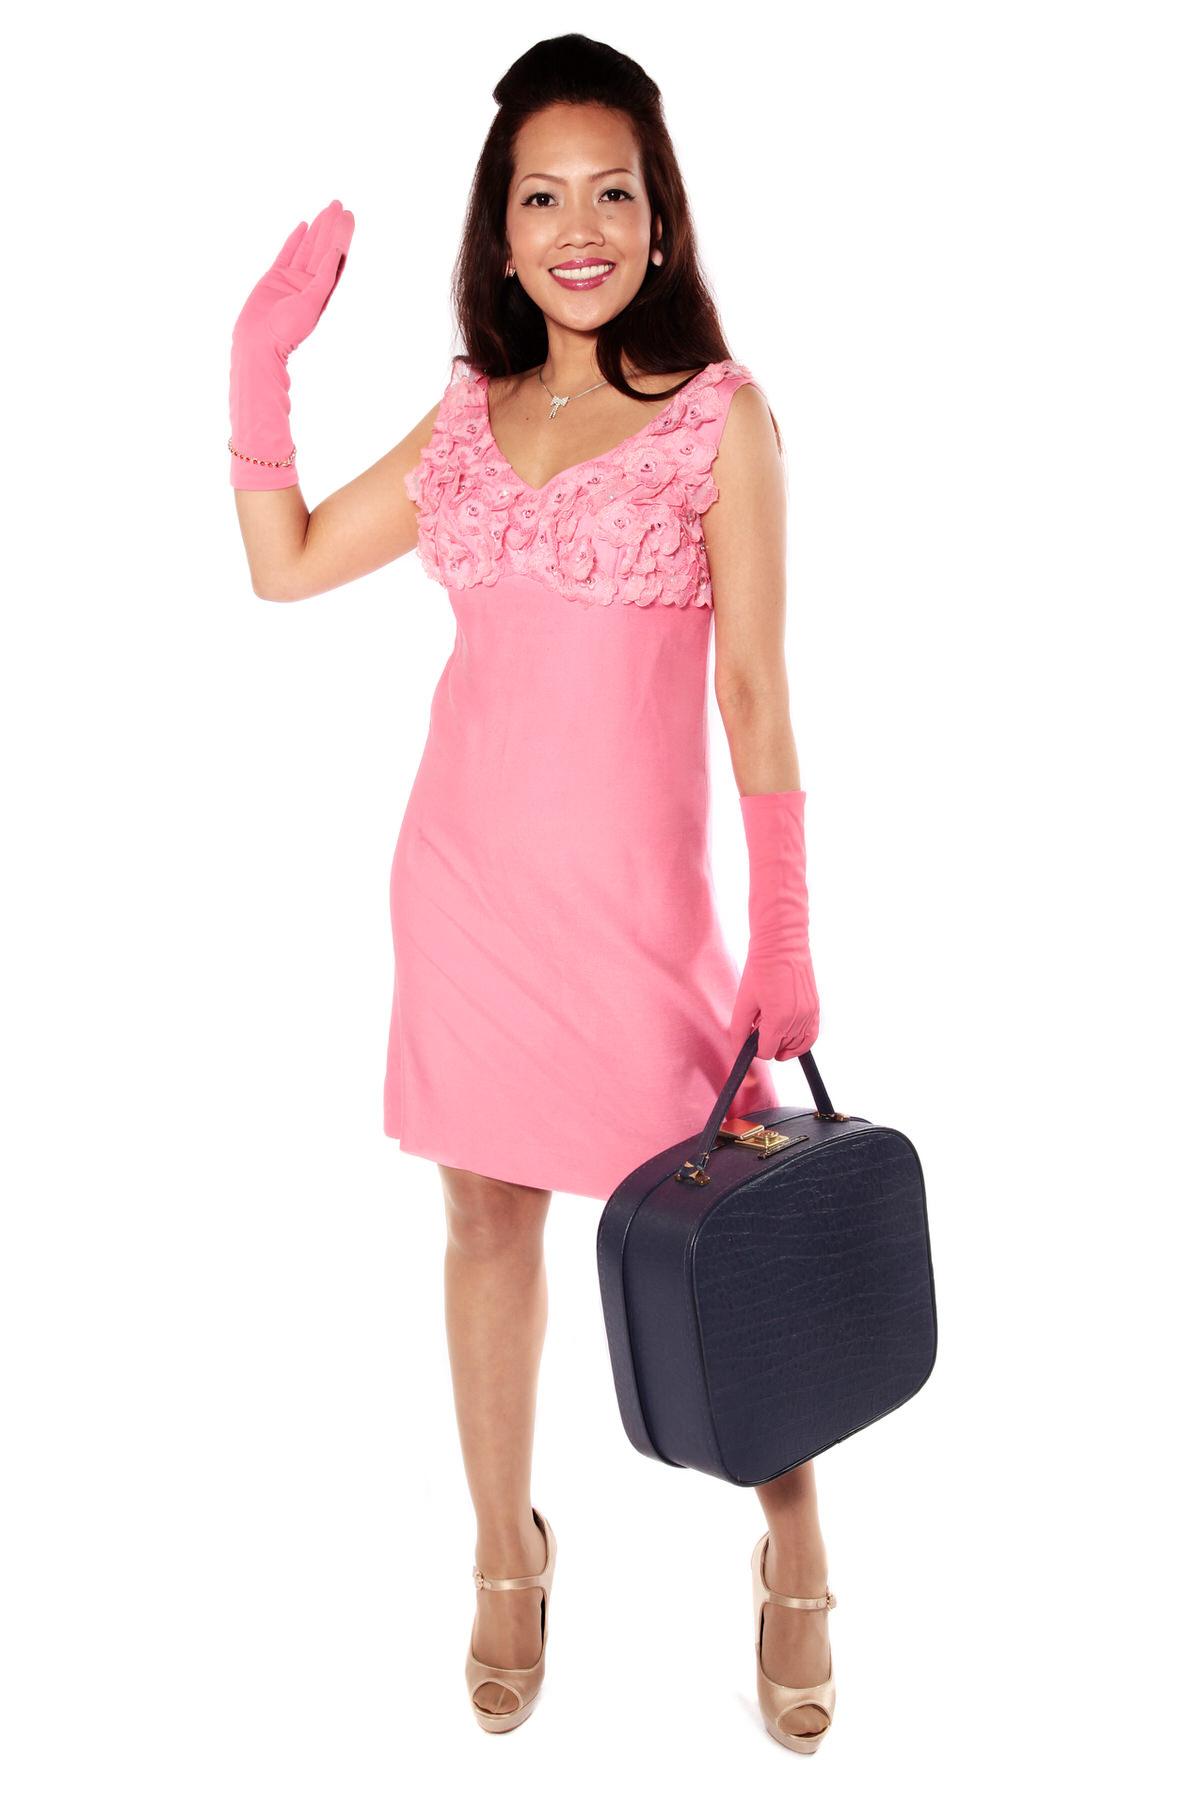 PINK 60s MINI DRESS COSTUME W MATCHING GLOVES